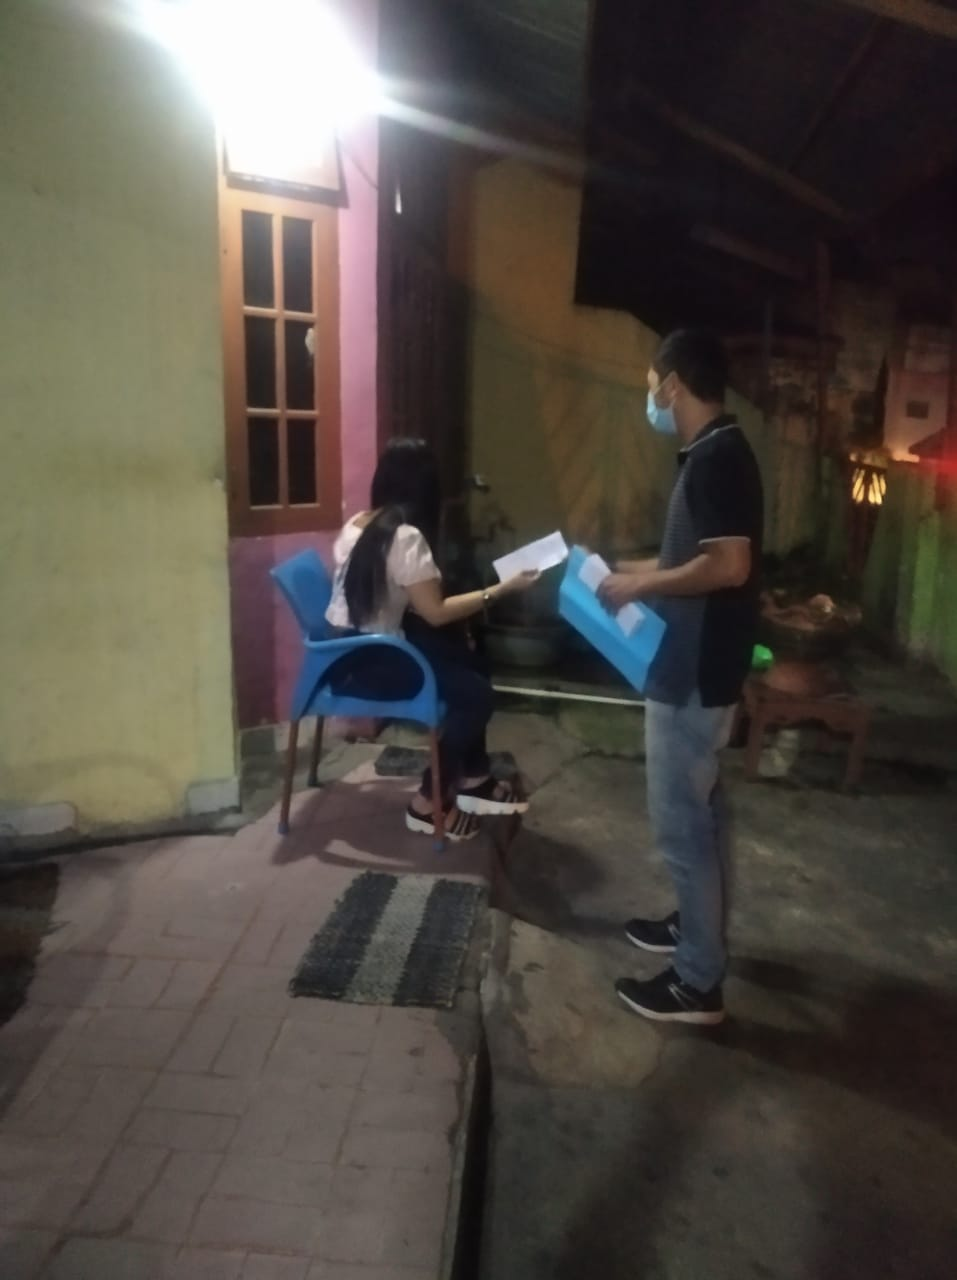 Satpol PP Layangkan Surat Teguran ke Dua ke Pengelola Panti Pijat di Jondul